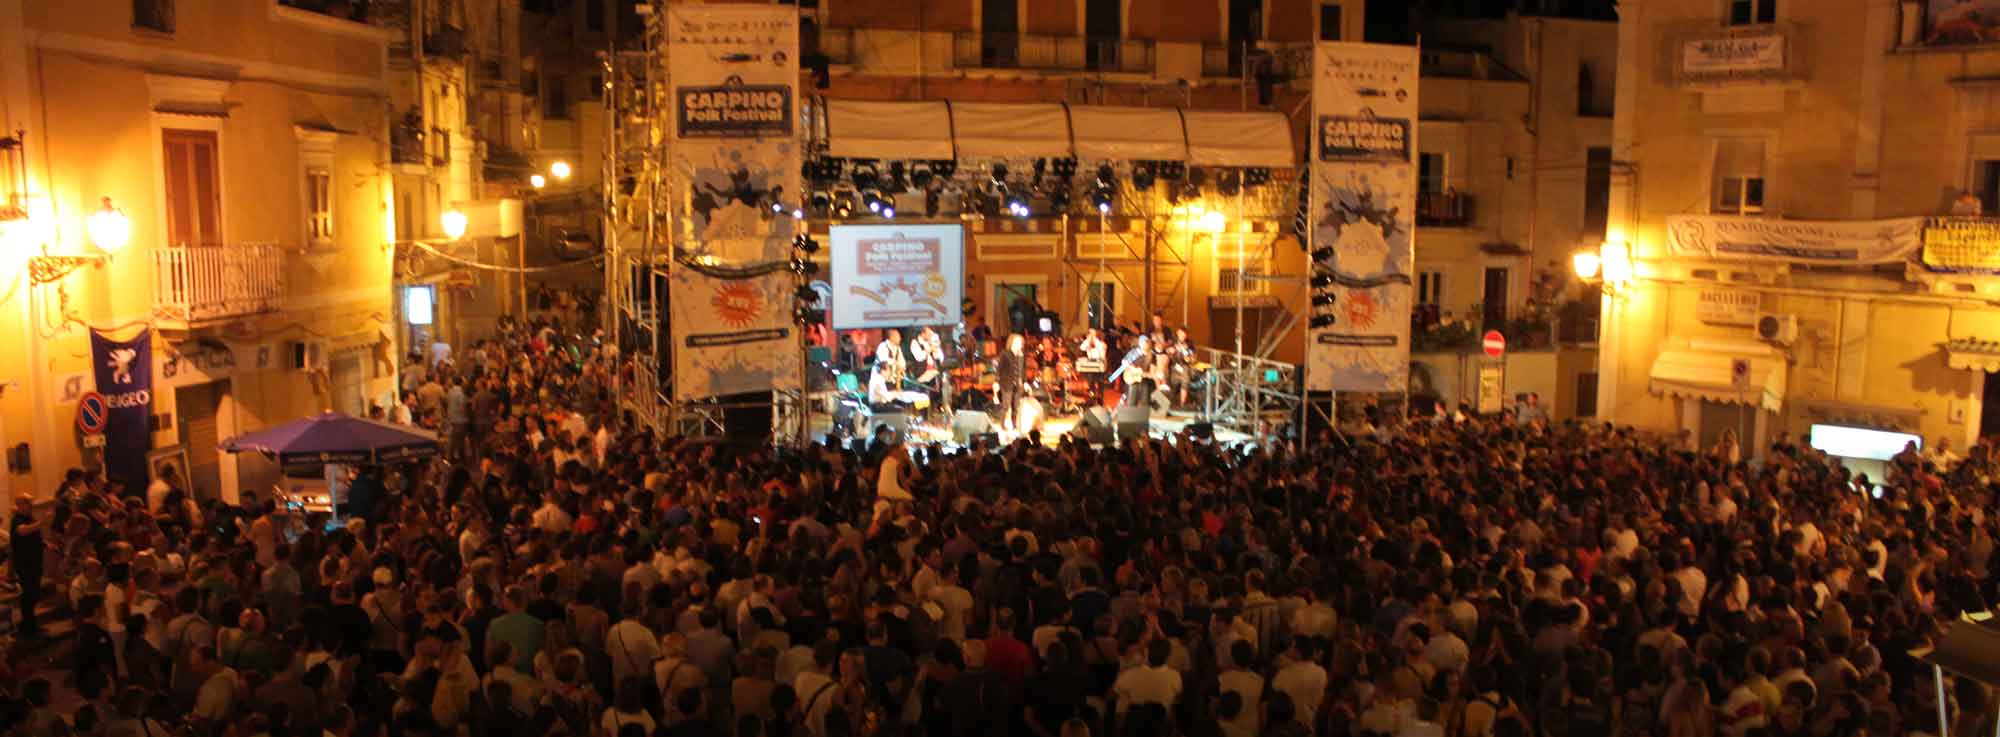 Carpino: Carpino Folk Festival